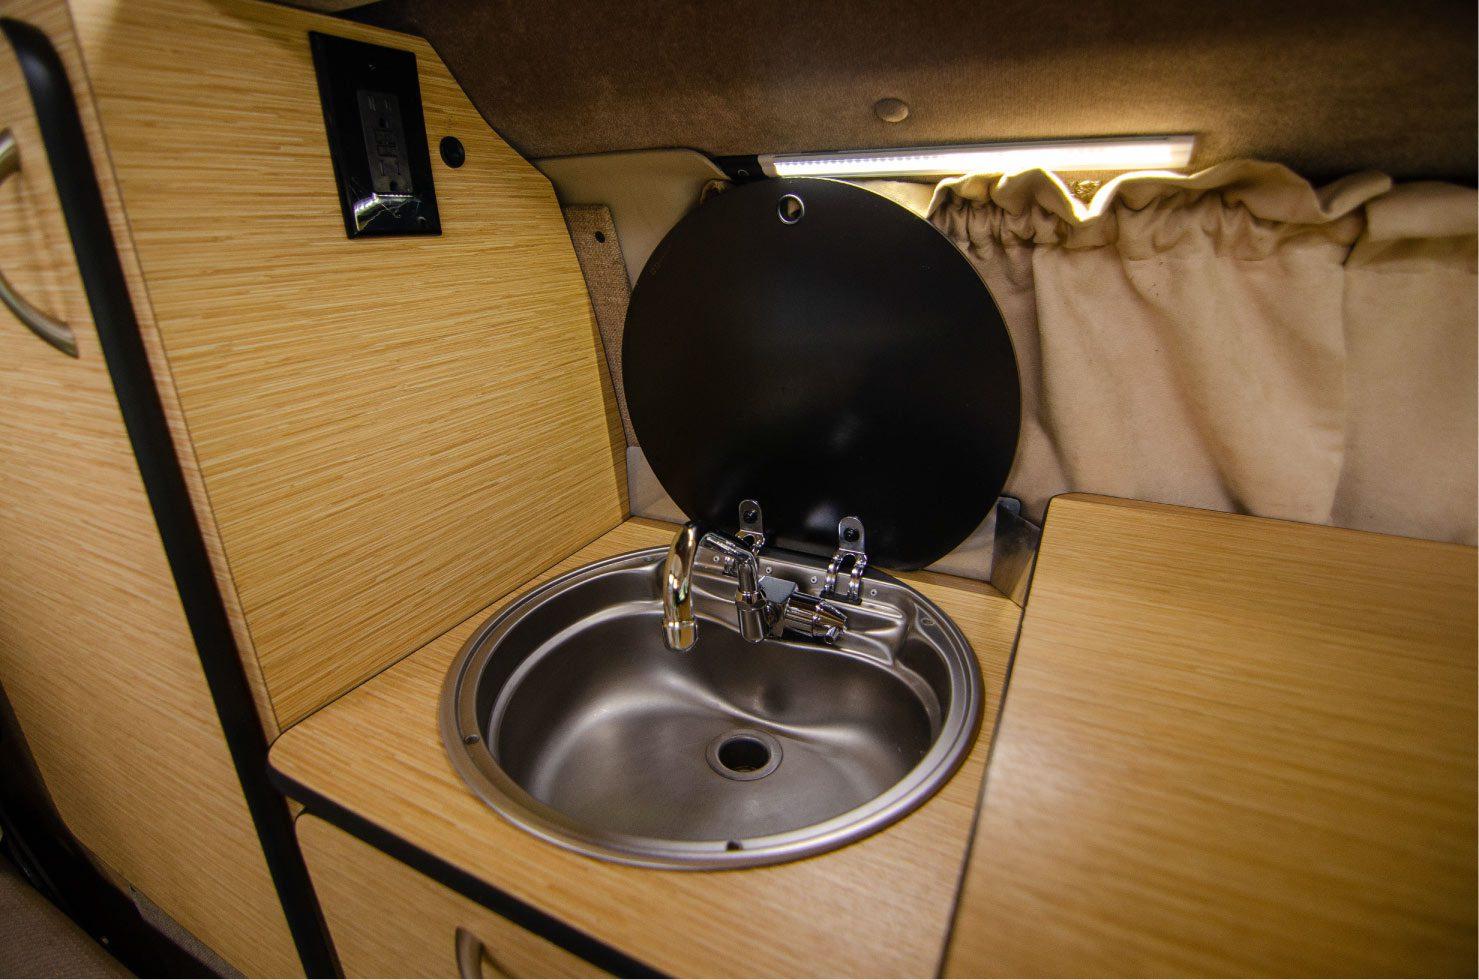 Sink inside a Ford E-Series 4x4 Econoline Sportsmobile RB50 Layout Campervan conversion for sale